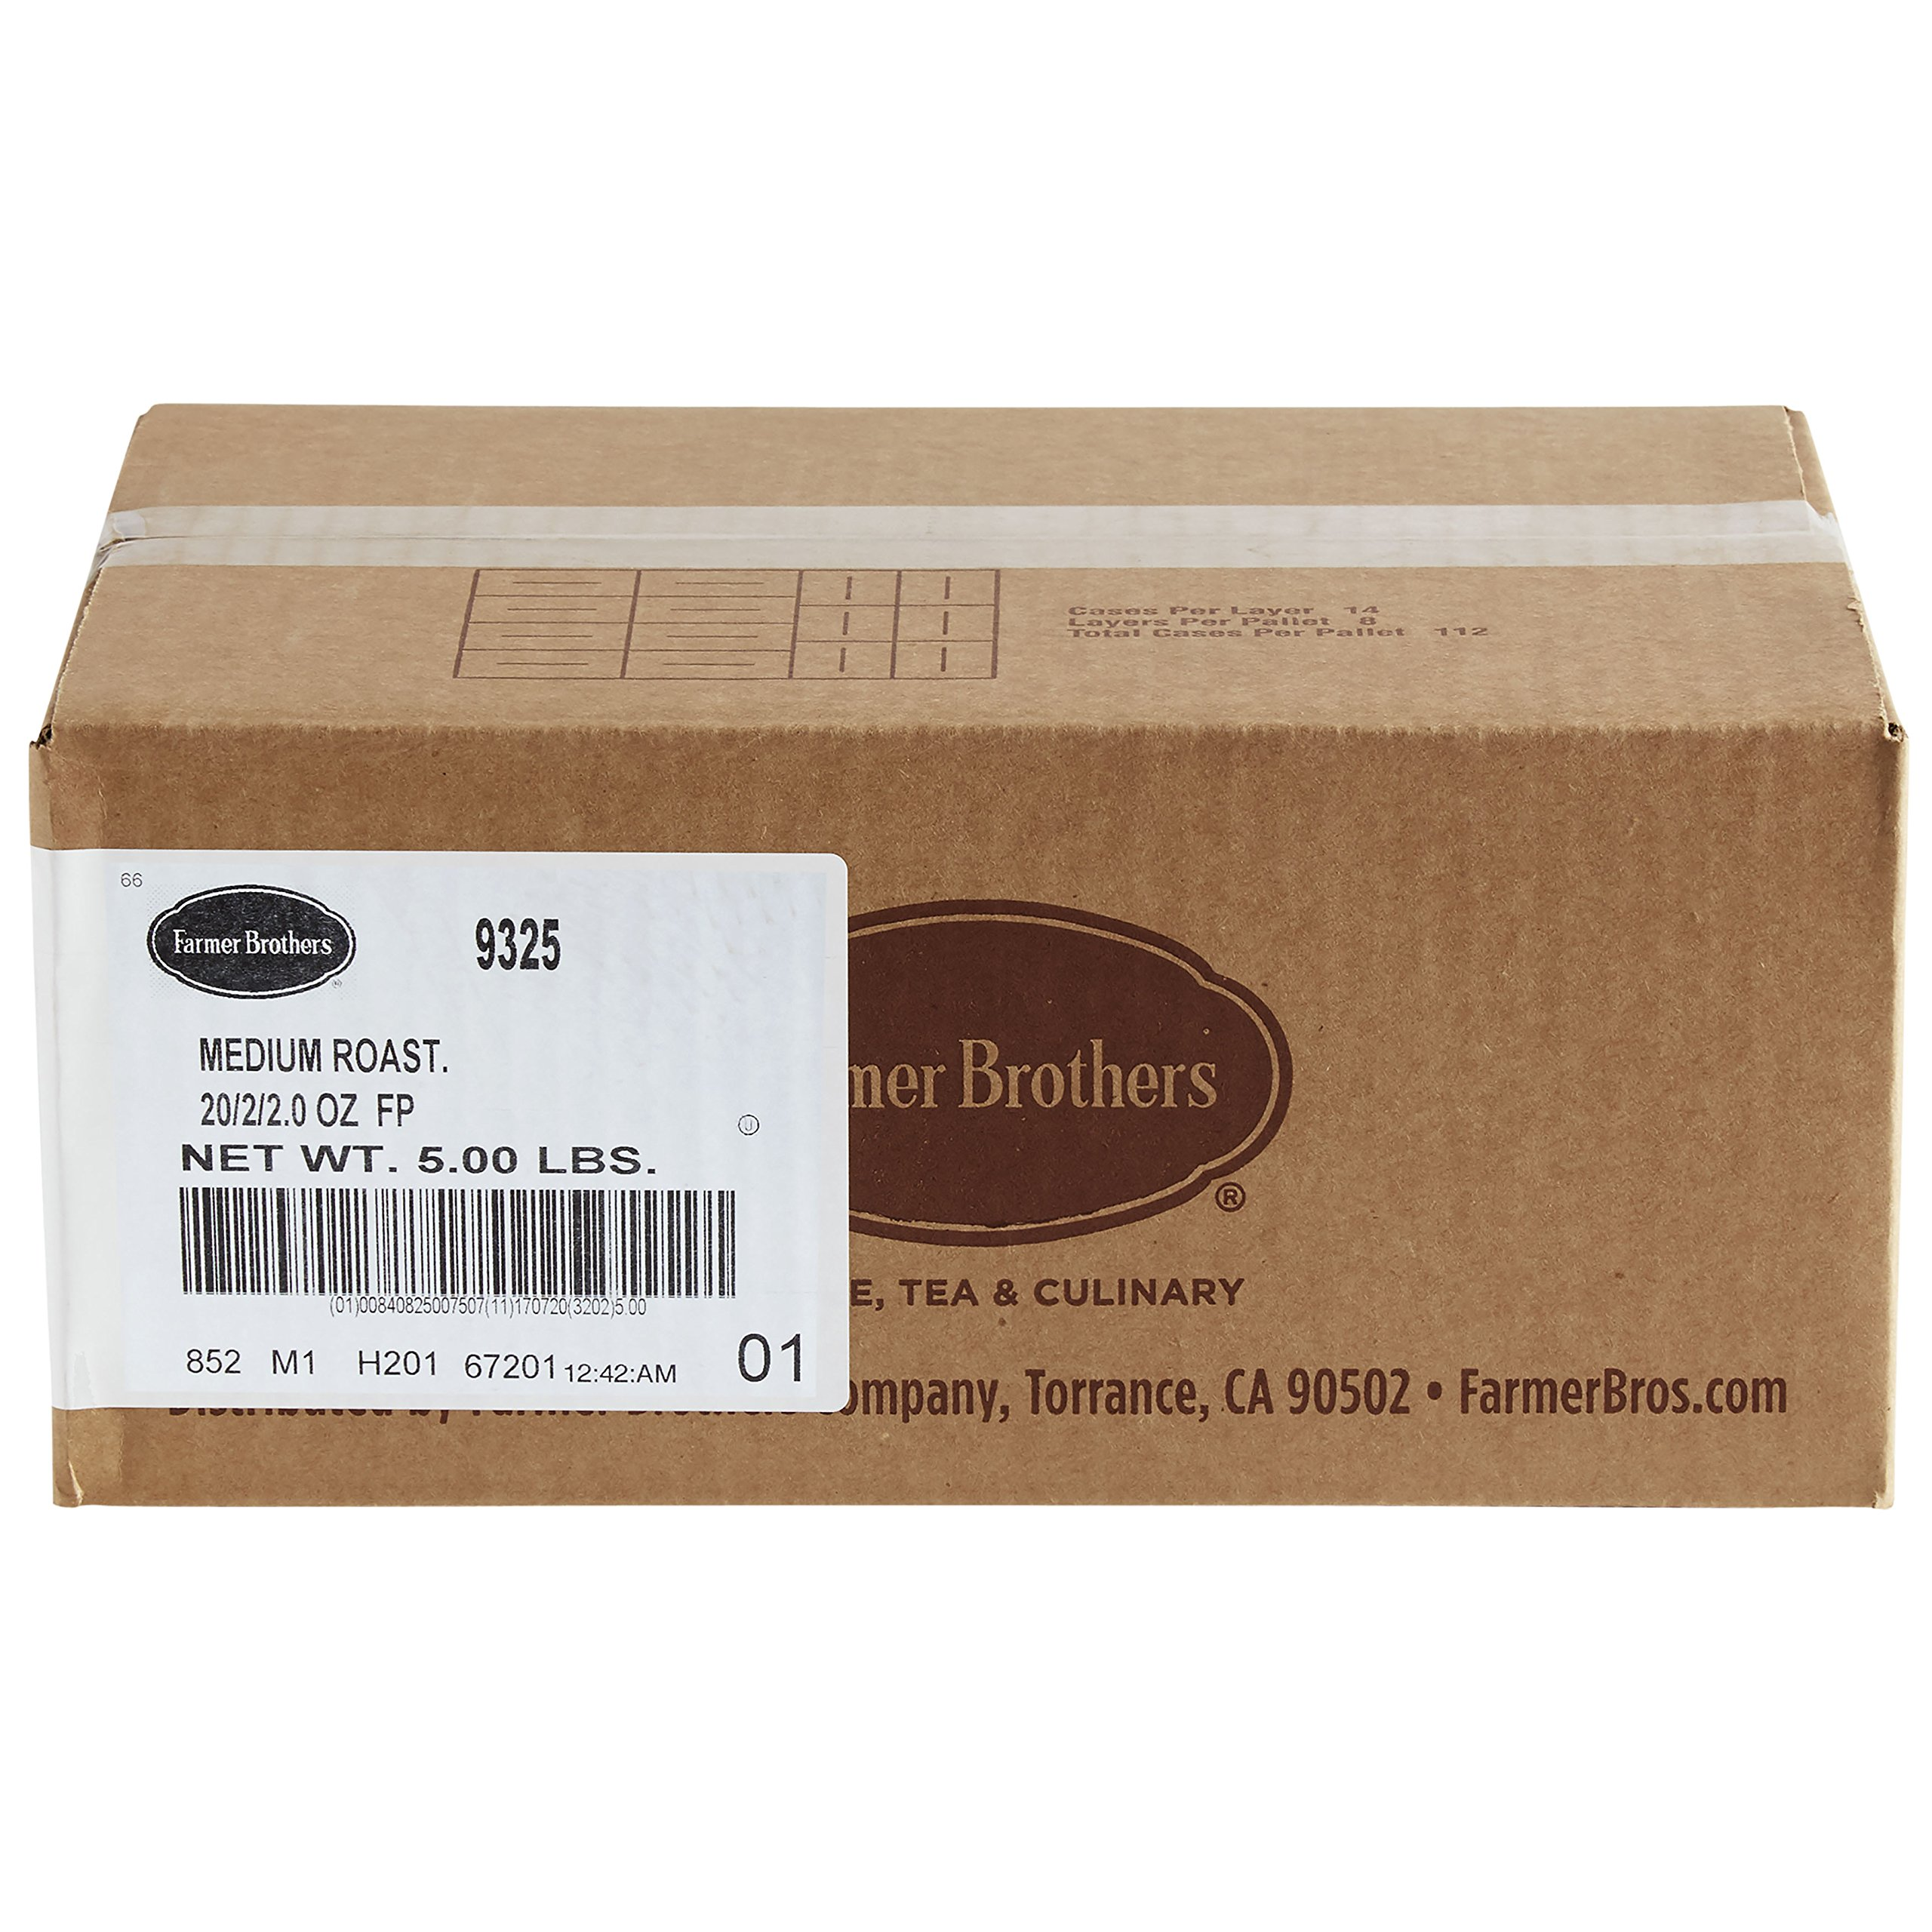 Farmer Brothers Coffee - Ground Medium Roast 2 Oz Filterpack (Bulk 40 Pack - $1.09 cost per pack)